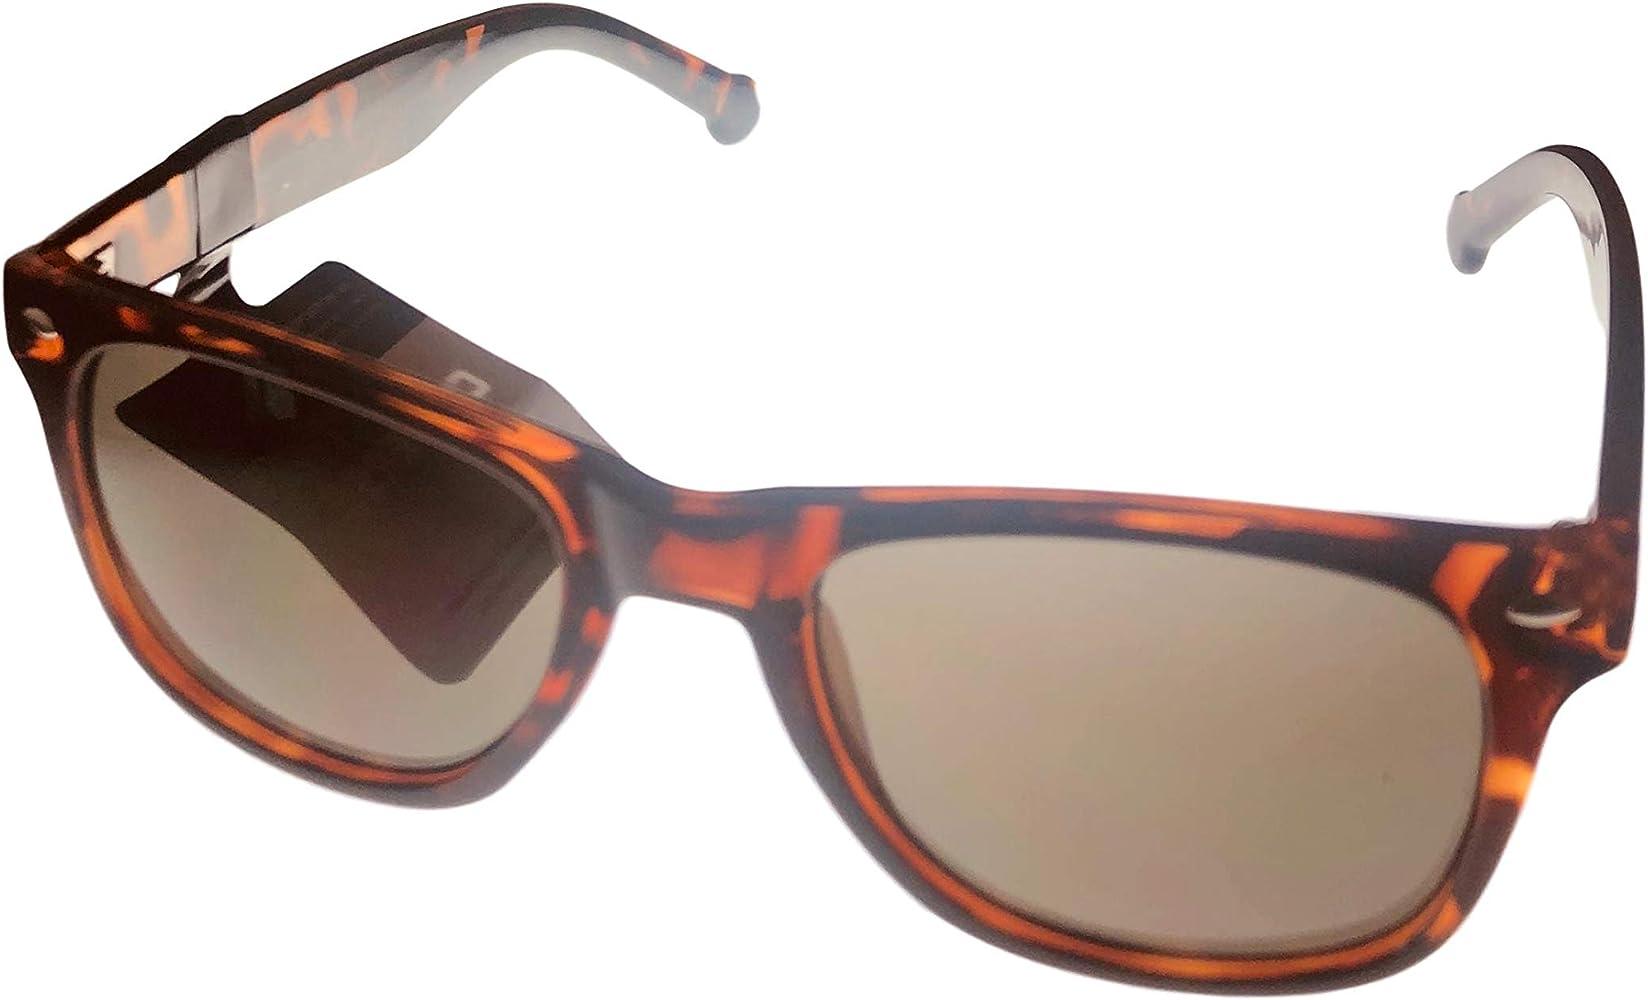 Amazon.com: Converse Chuck Taylor Sunglasses H060 TORTOISE 51/19 ...